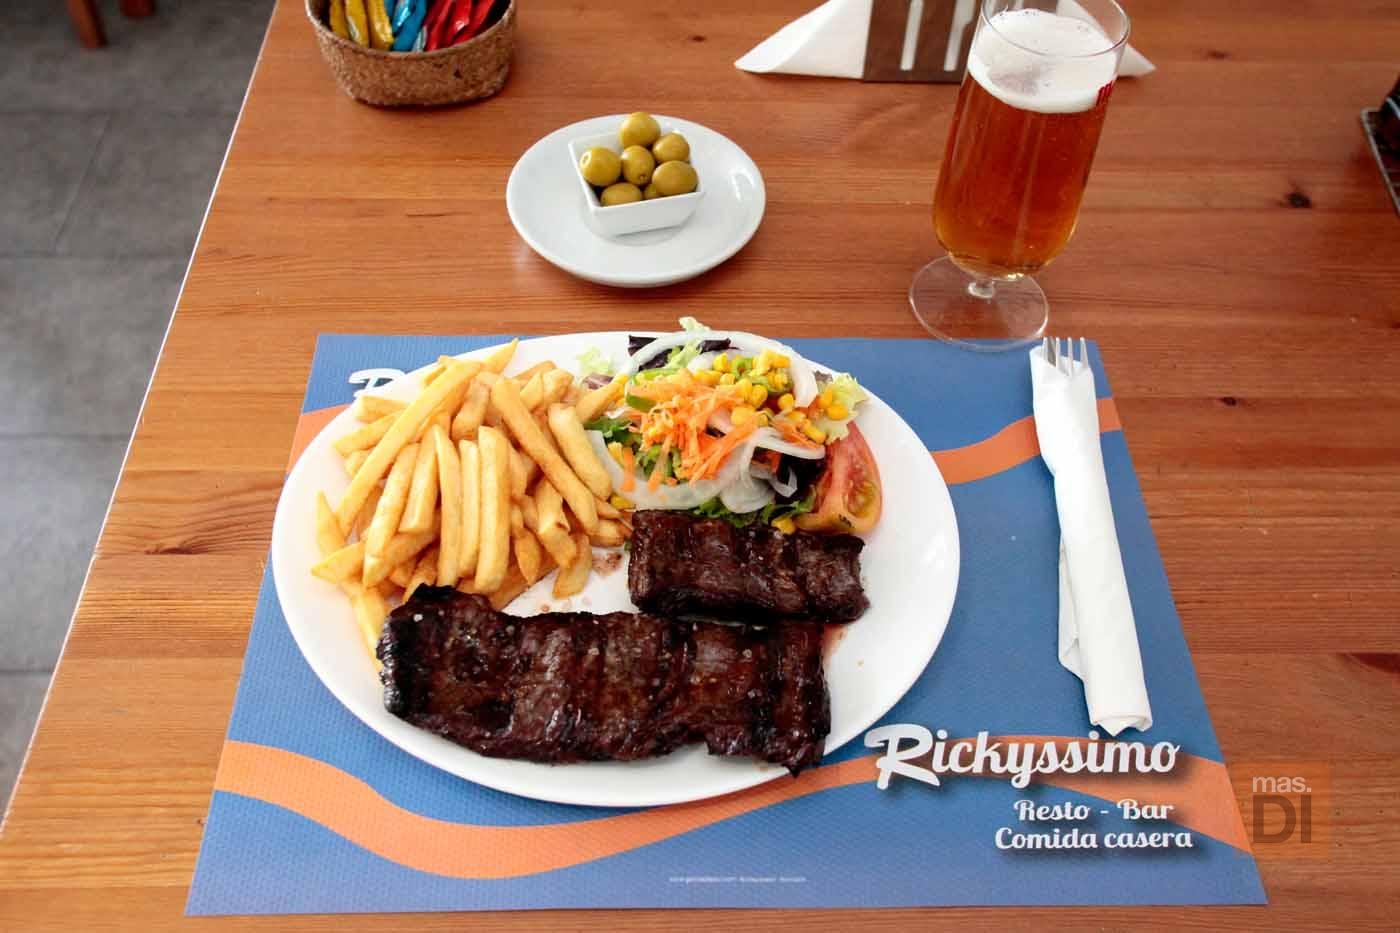 Restaurante Rickyssimo. Auténtica comida casera a un paso de ses Figueretes